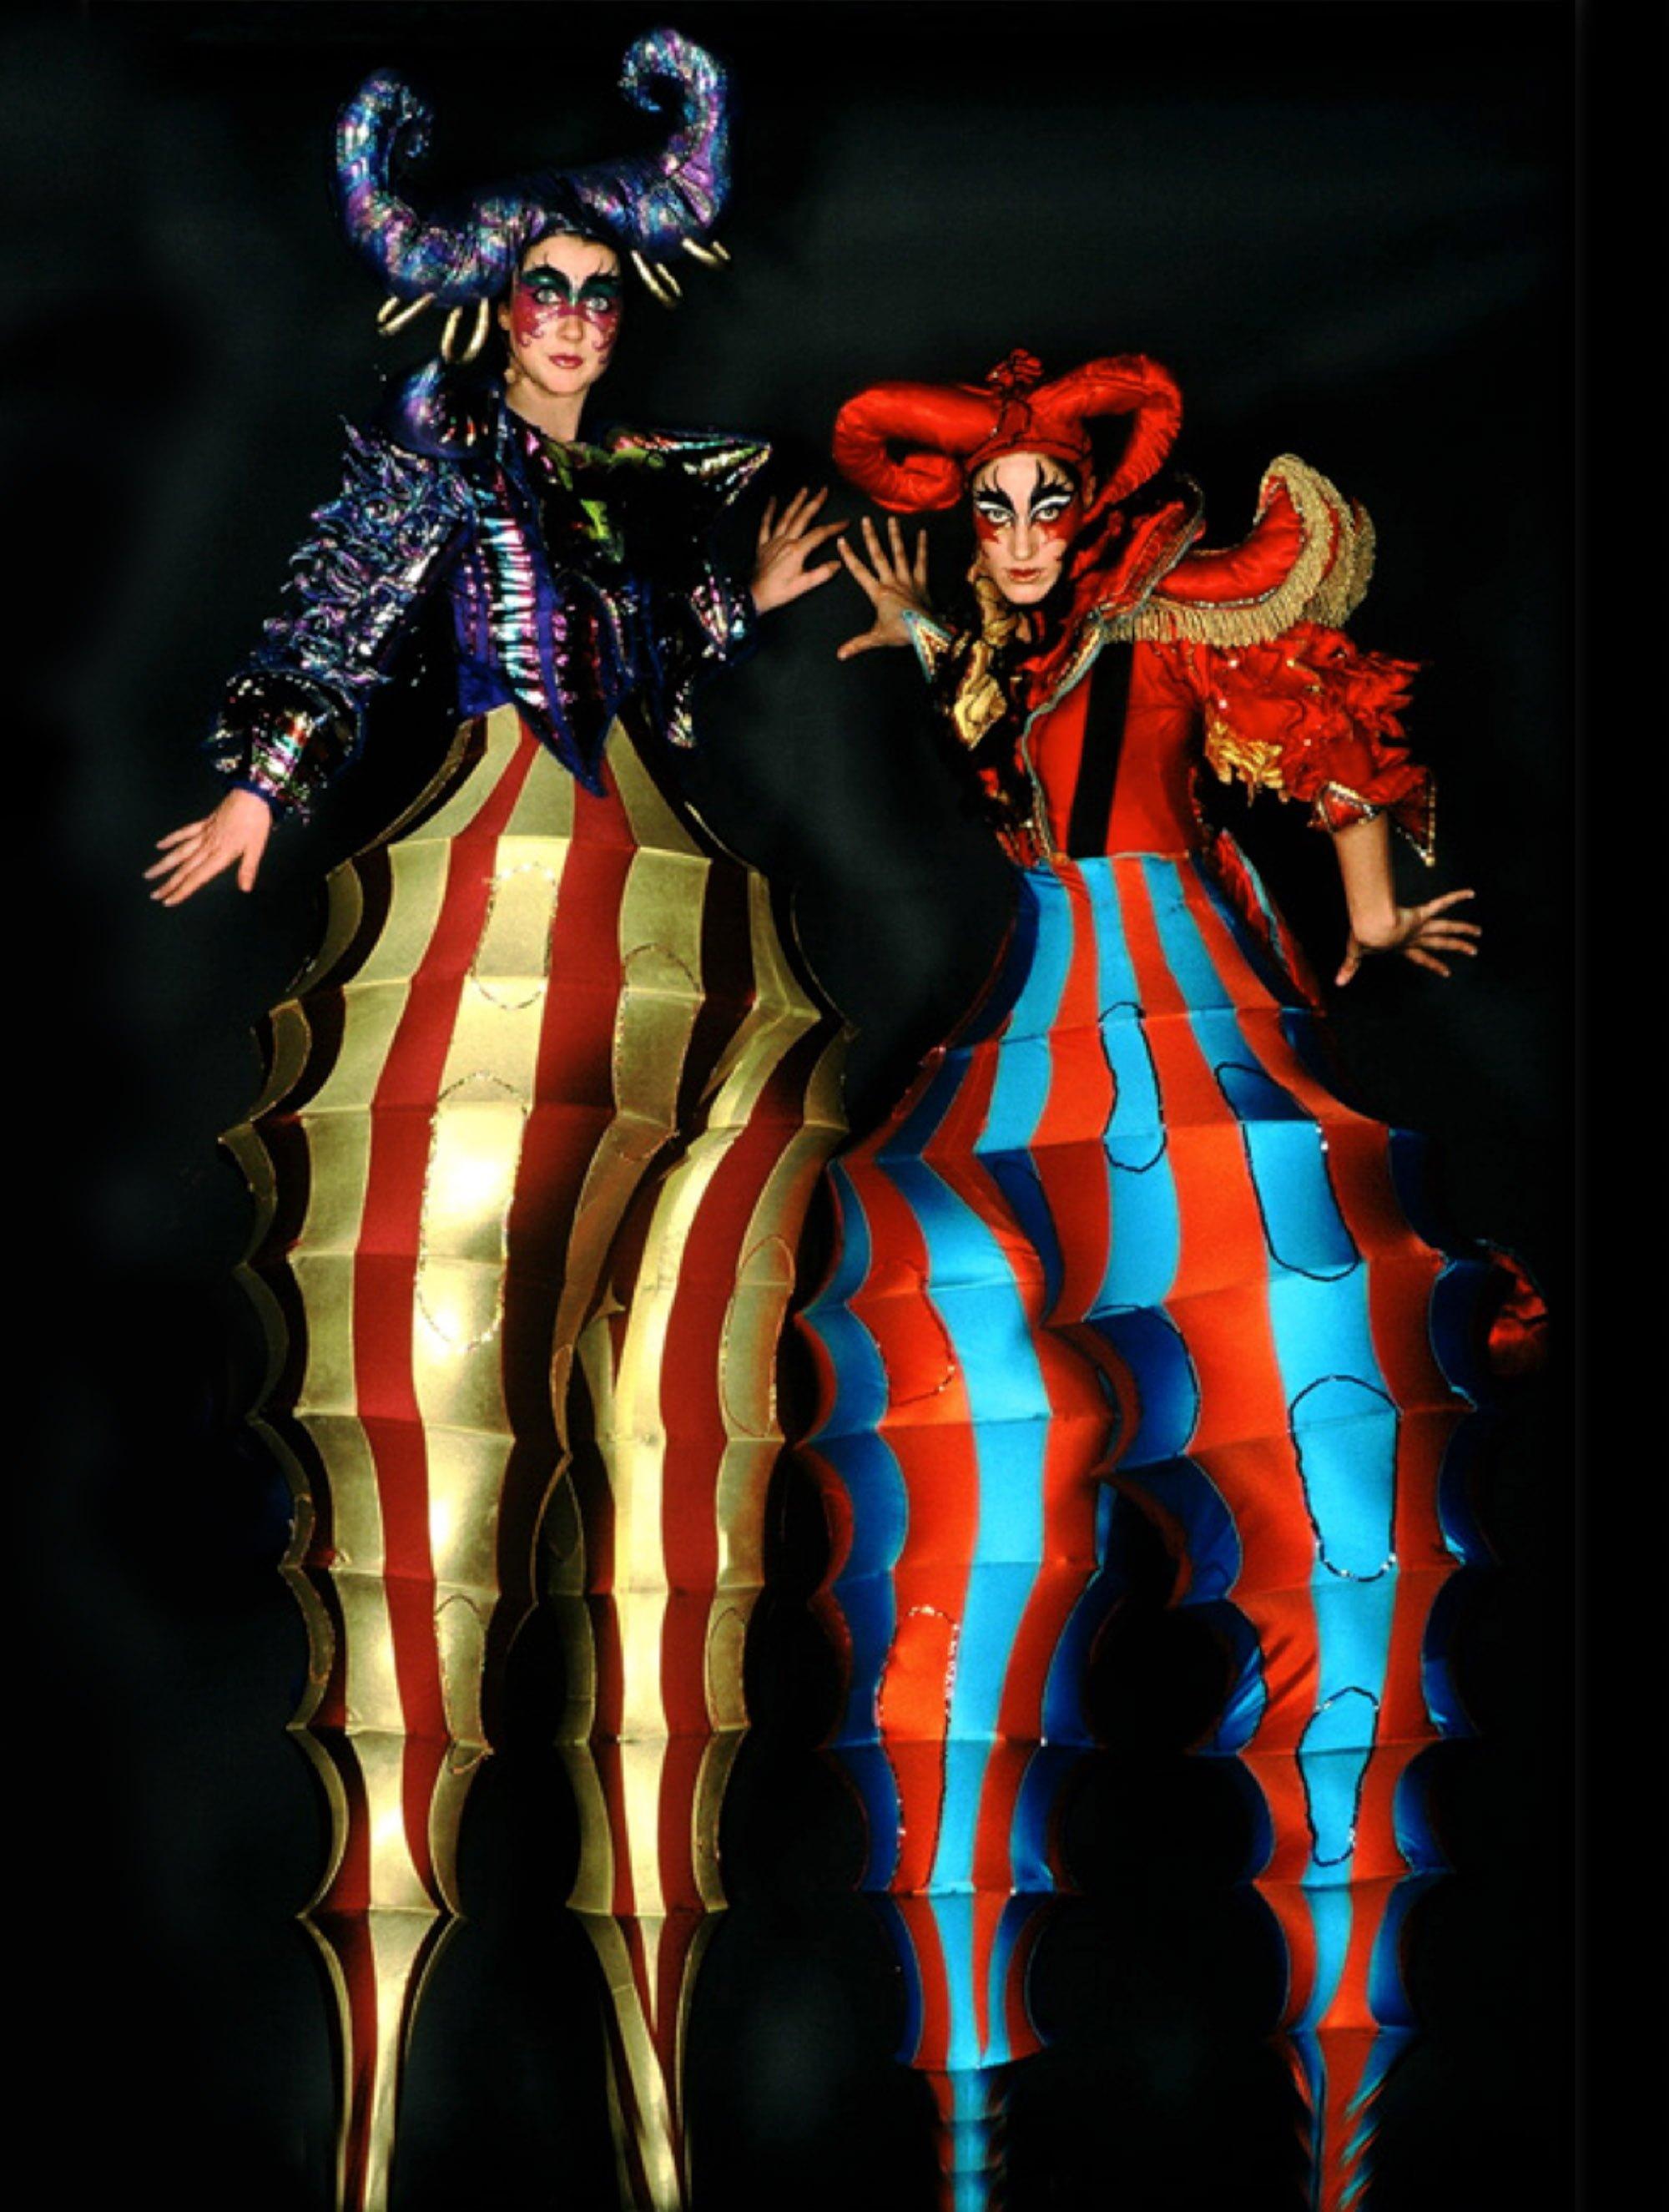 Sideshow Barb Costume on Stilts